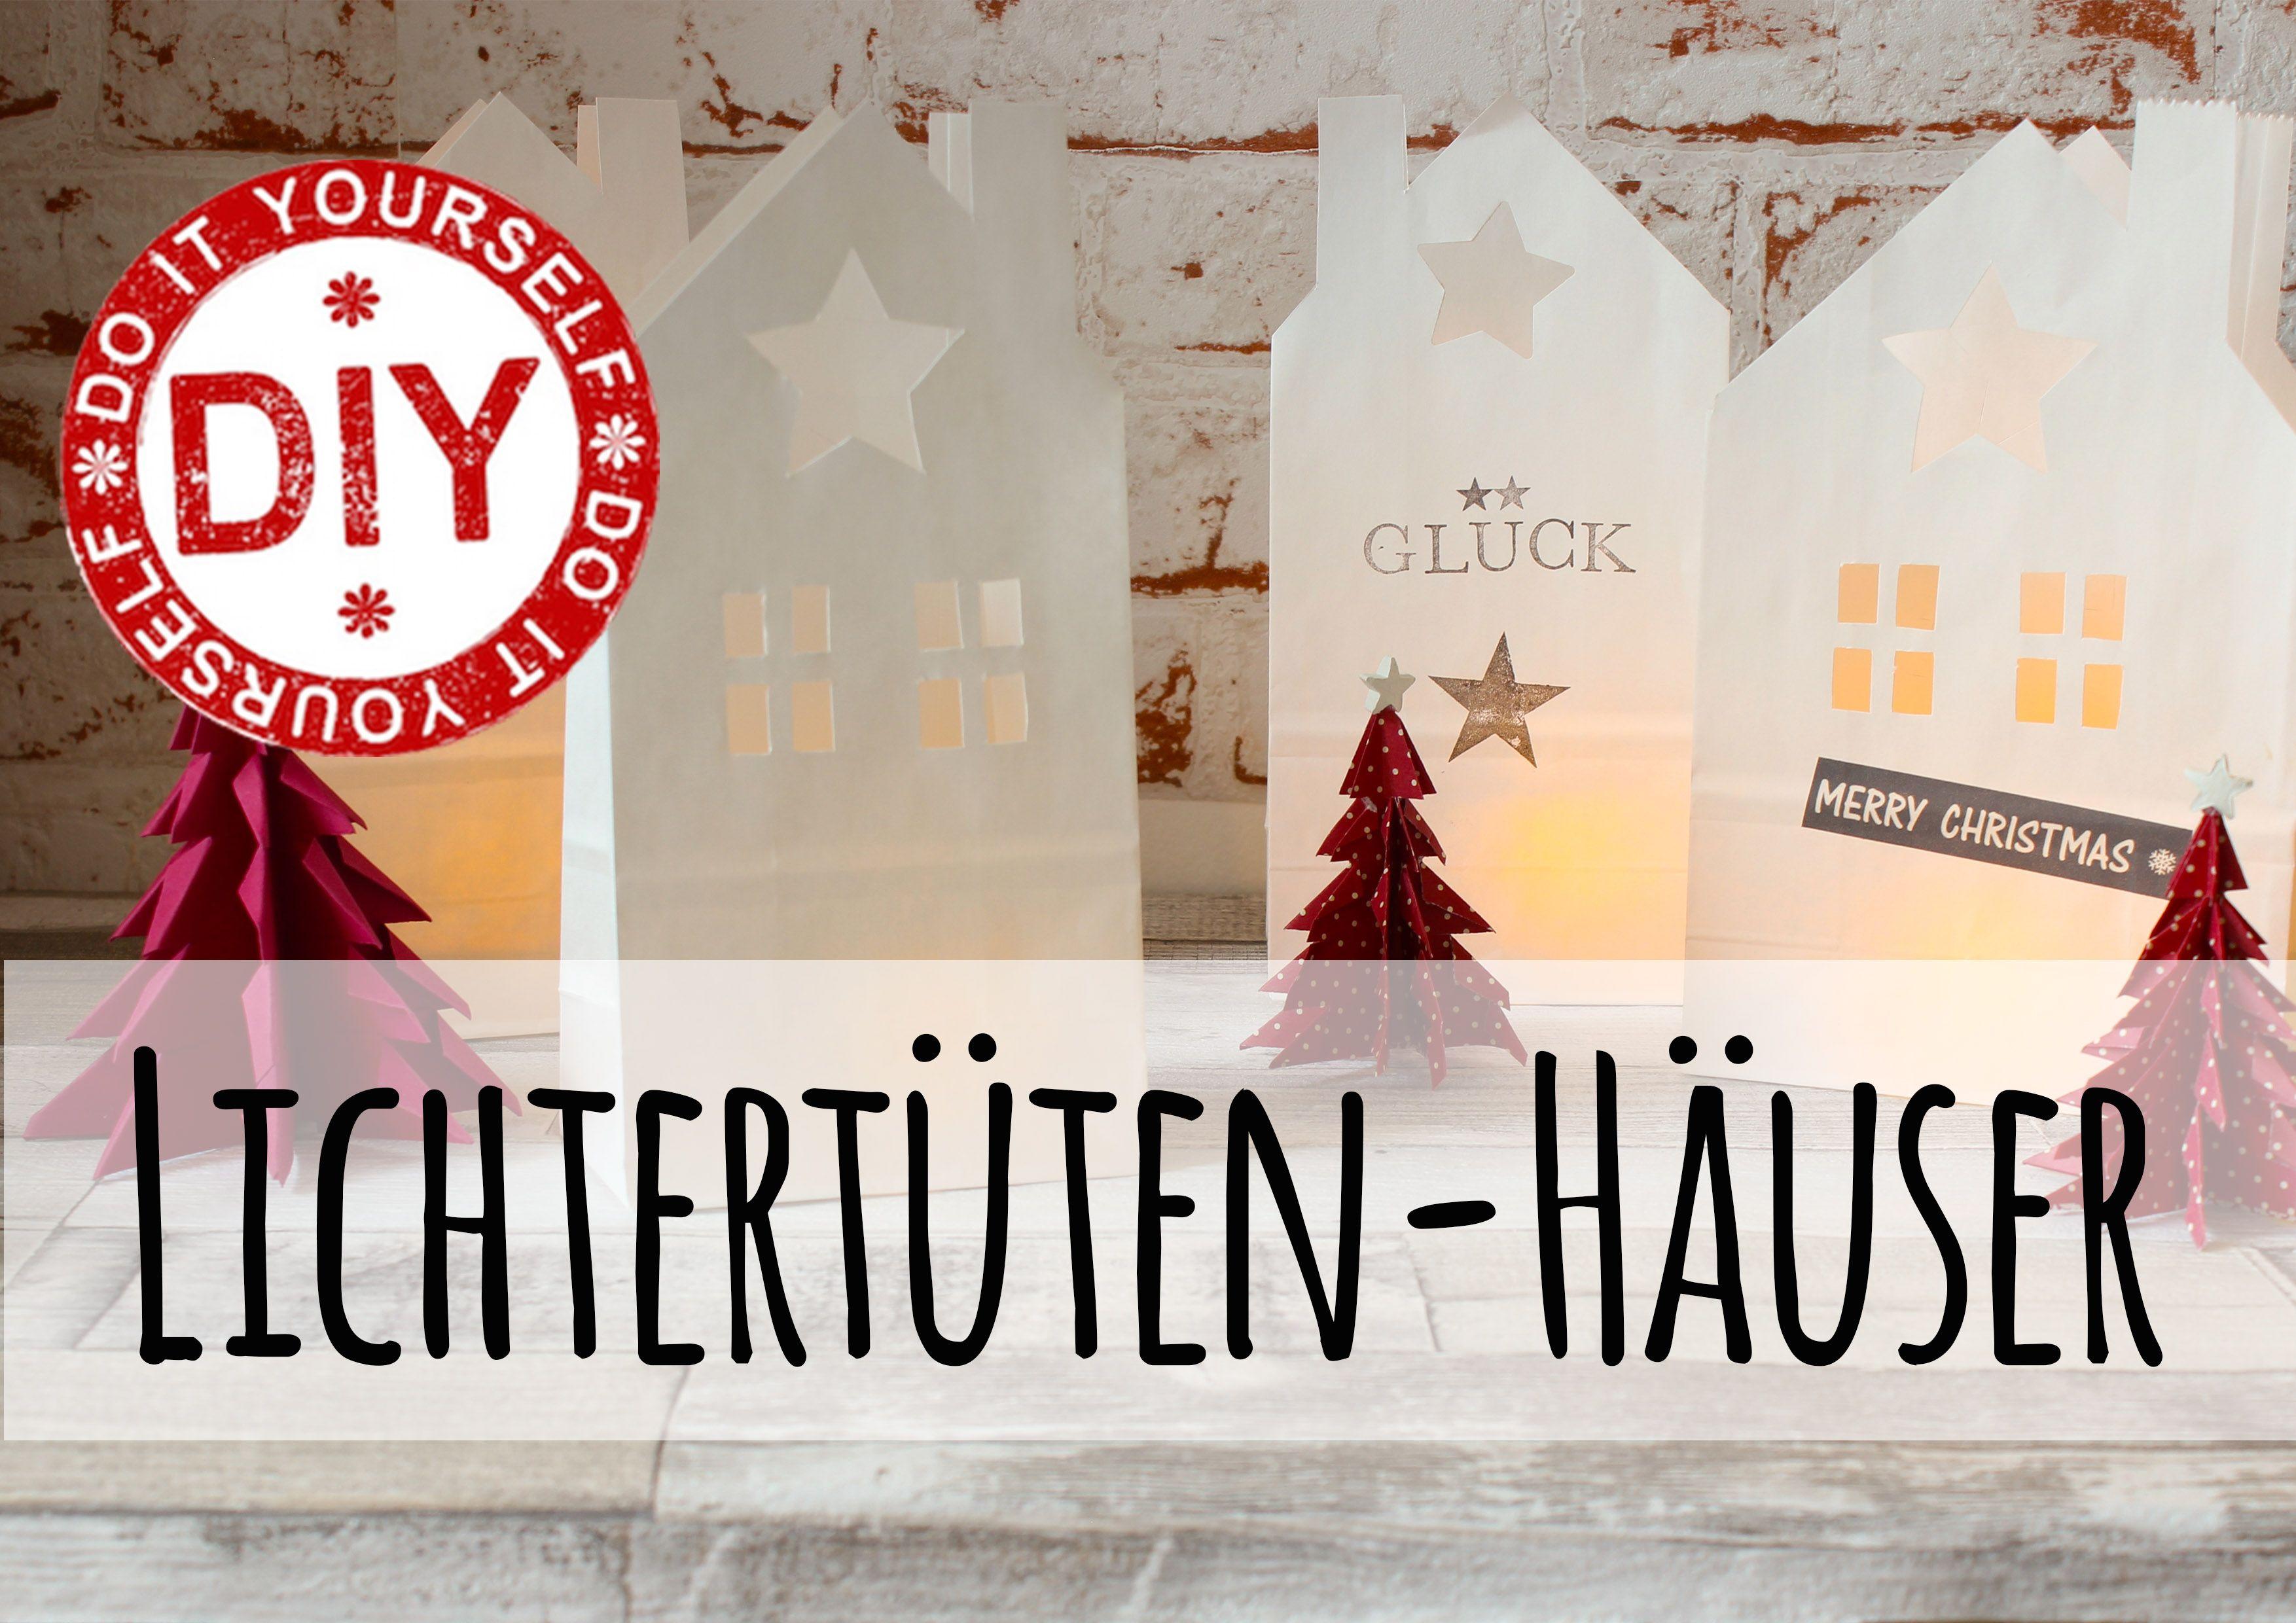 Lichtertüten in Hausform - Natural Hygge by Patricia Morgenthaler